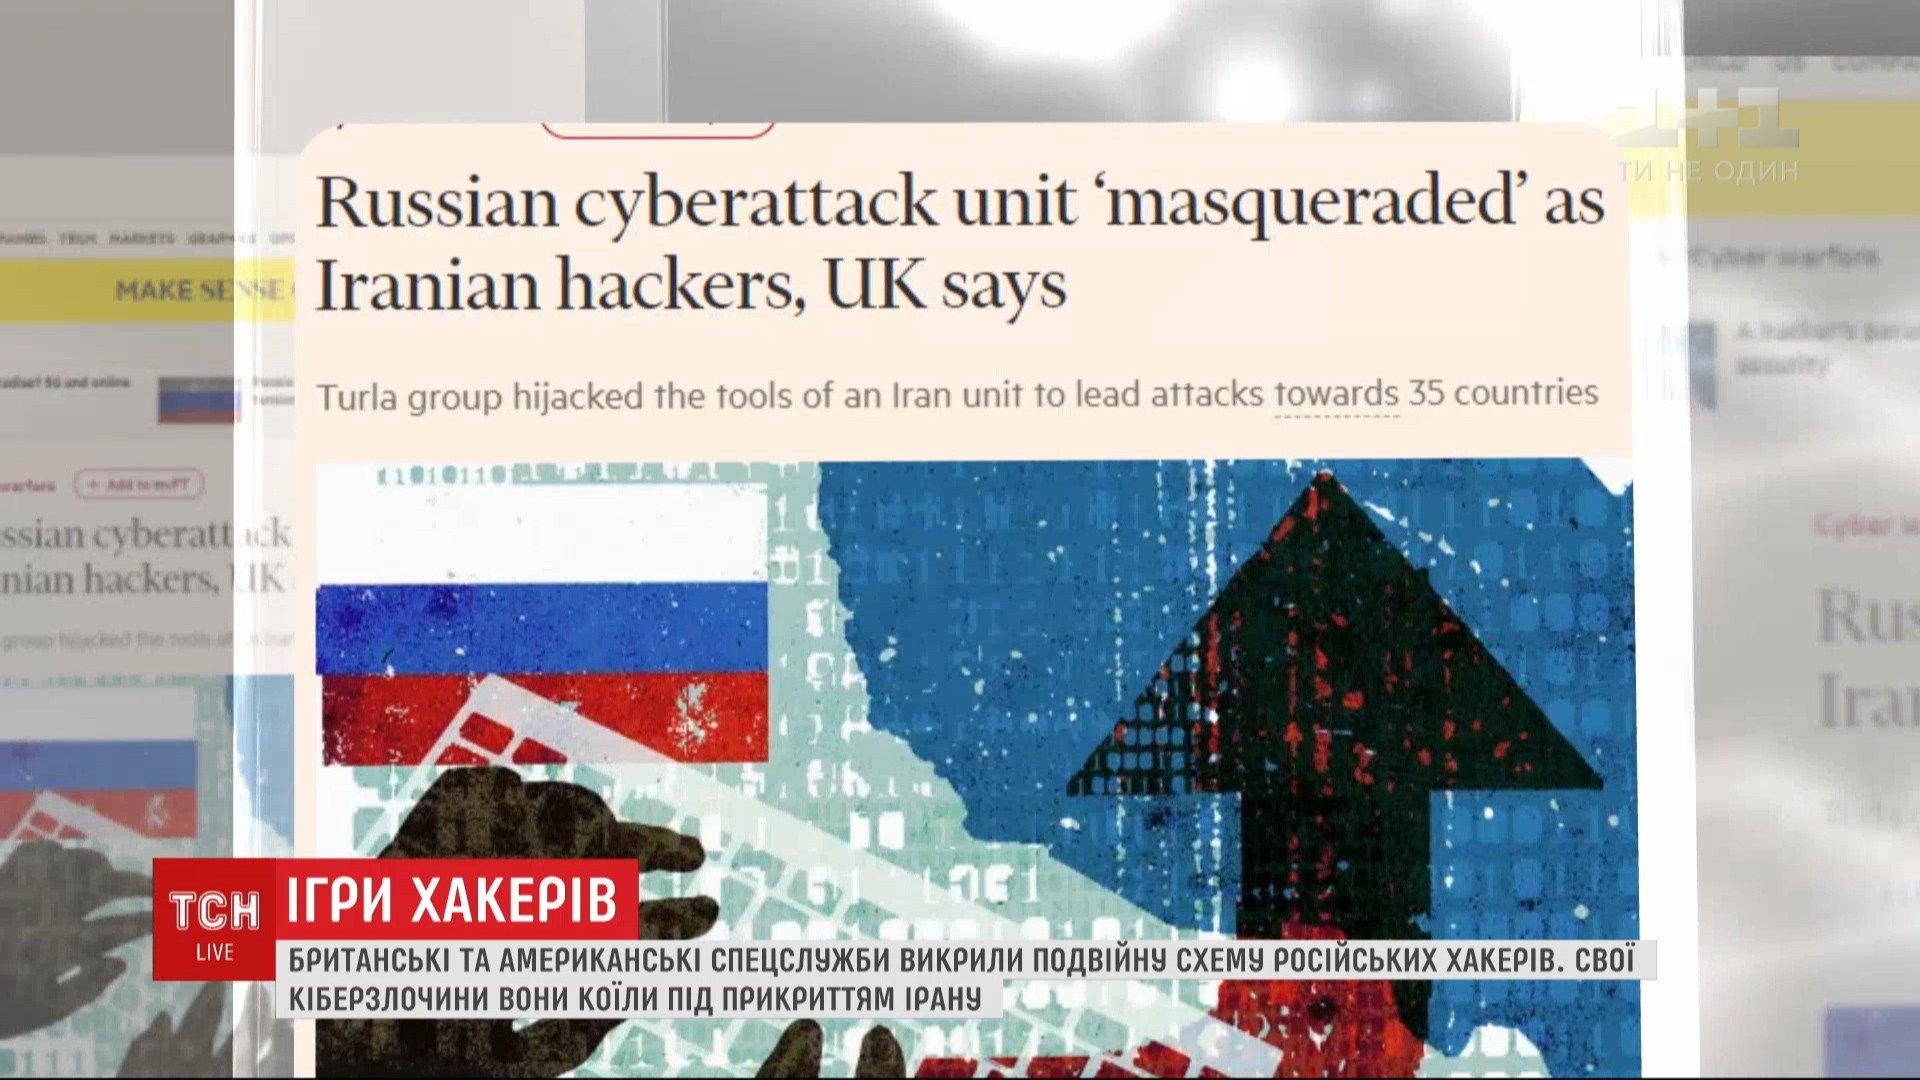 Хакеры совершали кибератаки под прикрытием Ирана / скриншот